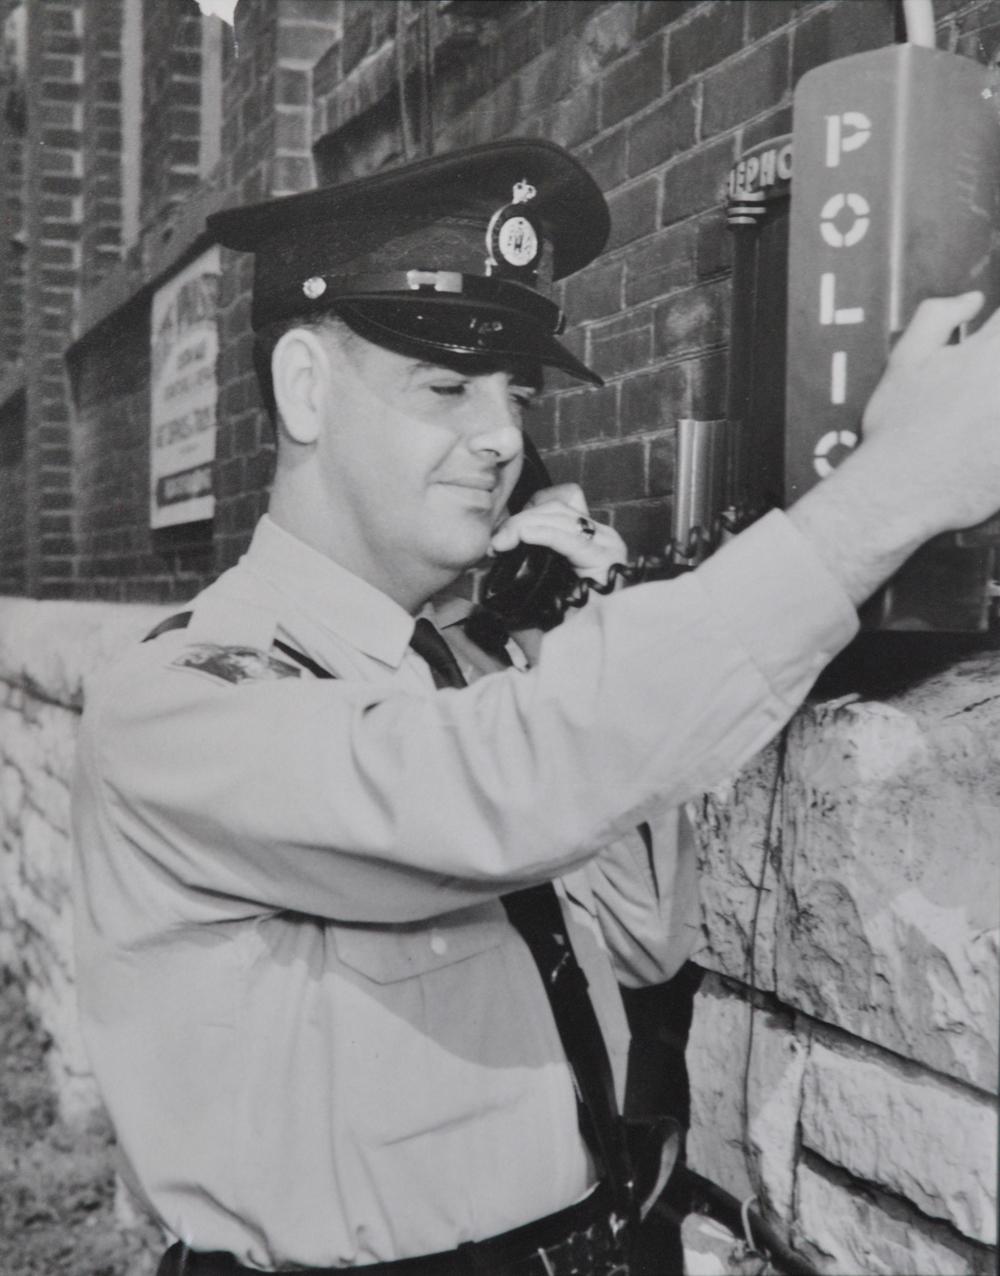 1960s, police phone